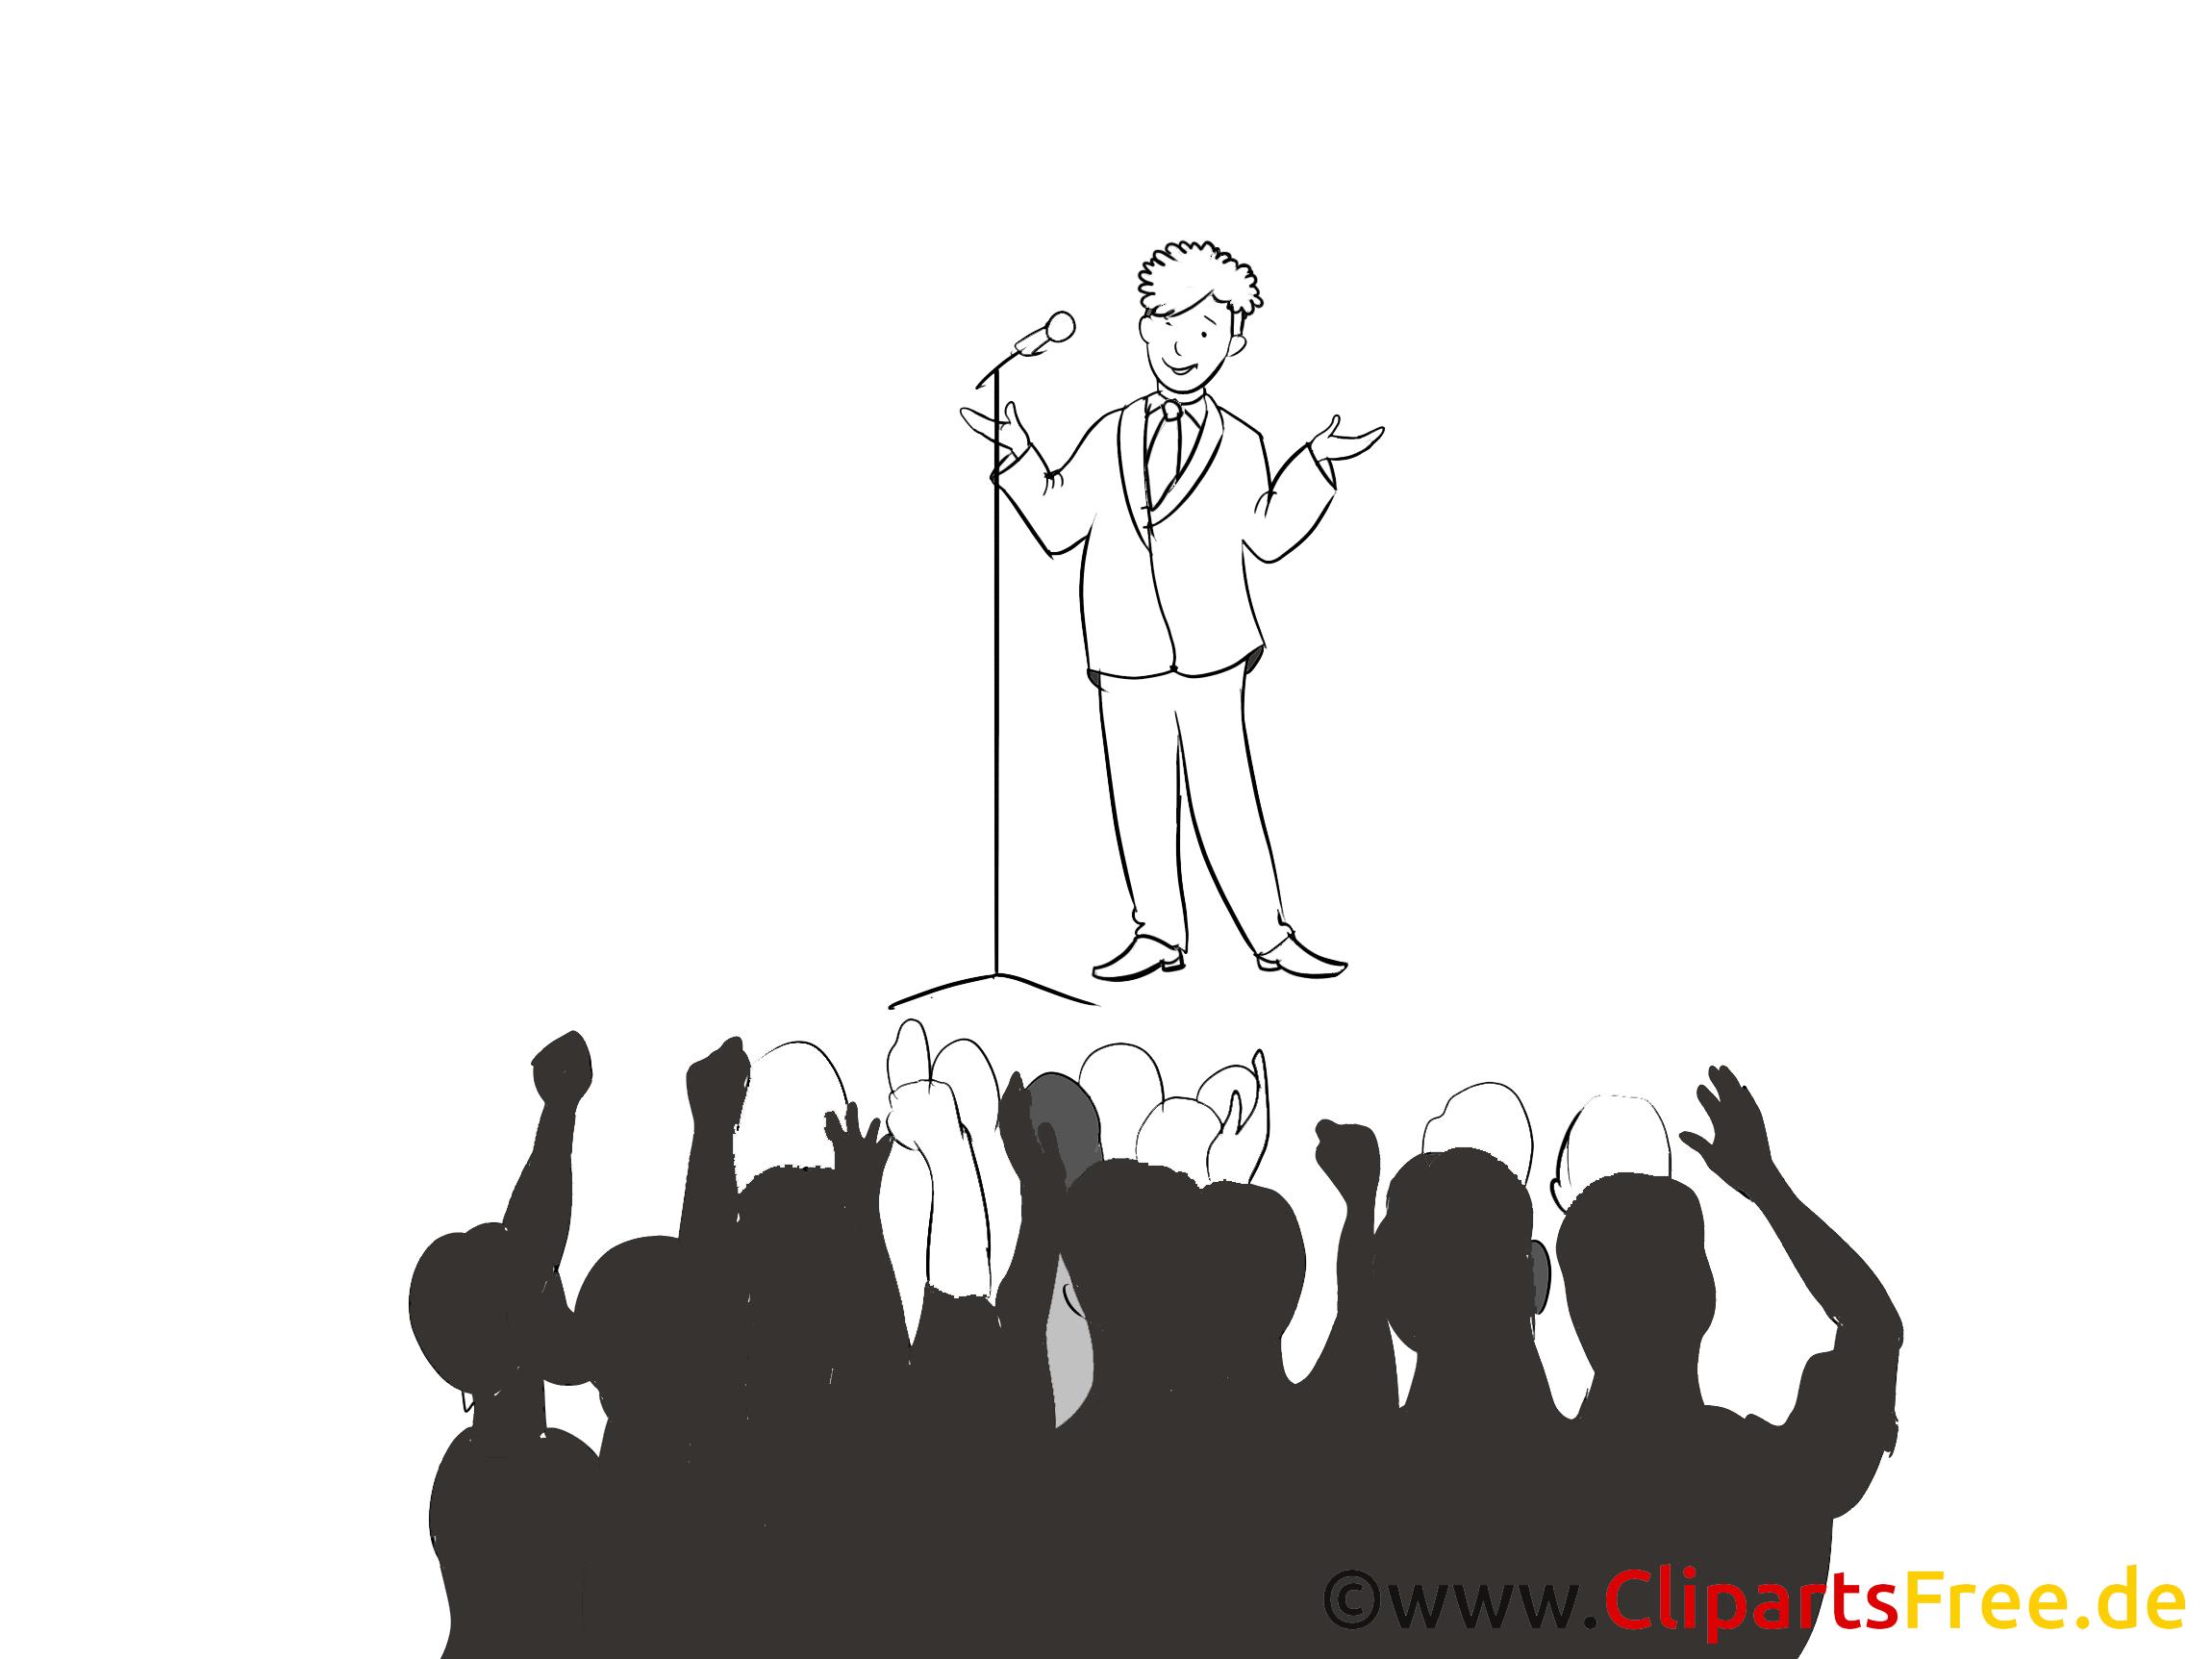 Vorstellung Bild, Clipart, Grafik, Cartoon, Illustration